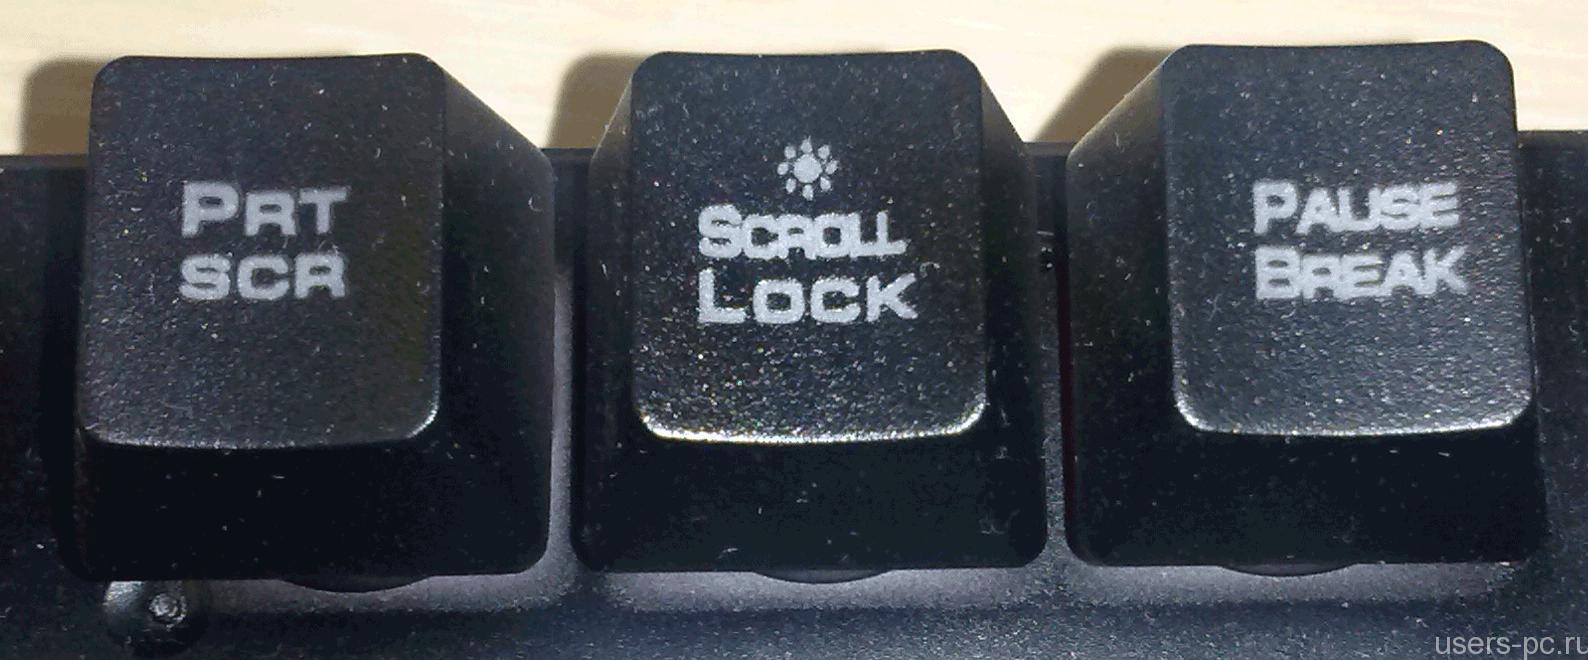 Scroll-Lock.png